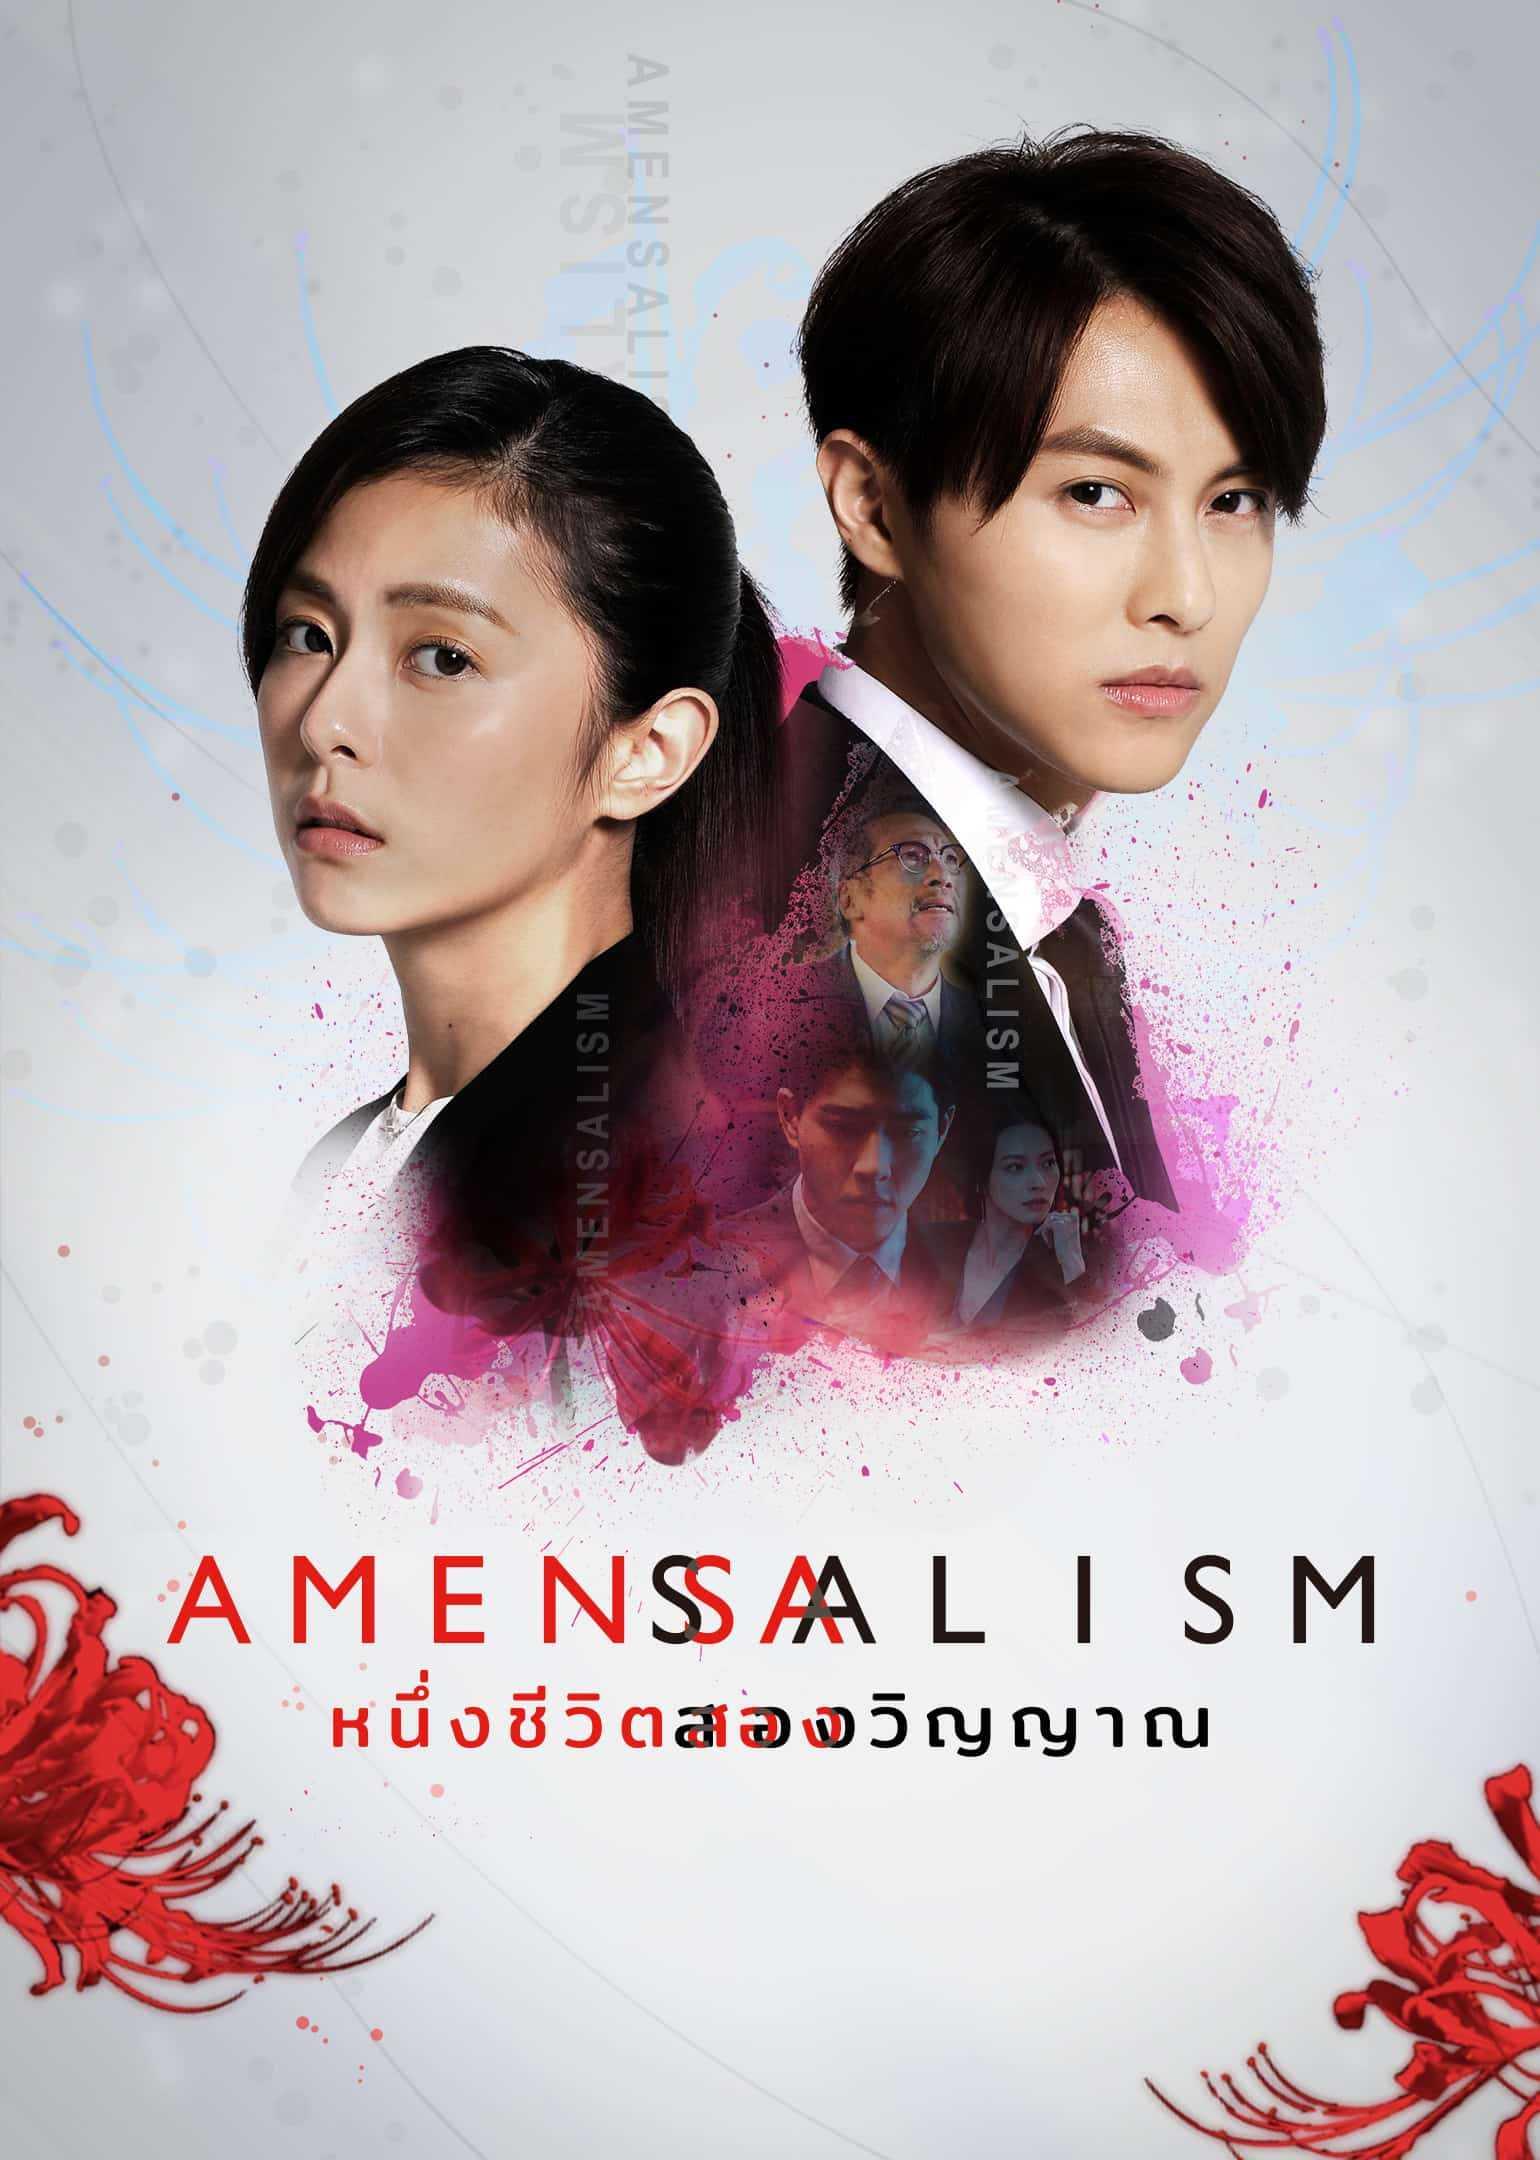 amensalism-หนึ่งชีวิต-สองวิญญาณ-2020-ตอนที่-1-13-ซับไทย-จบ-